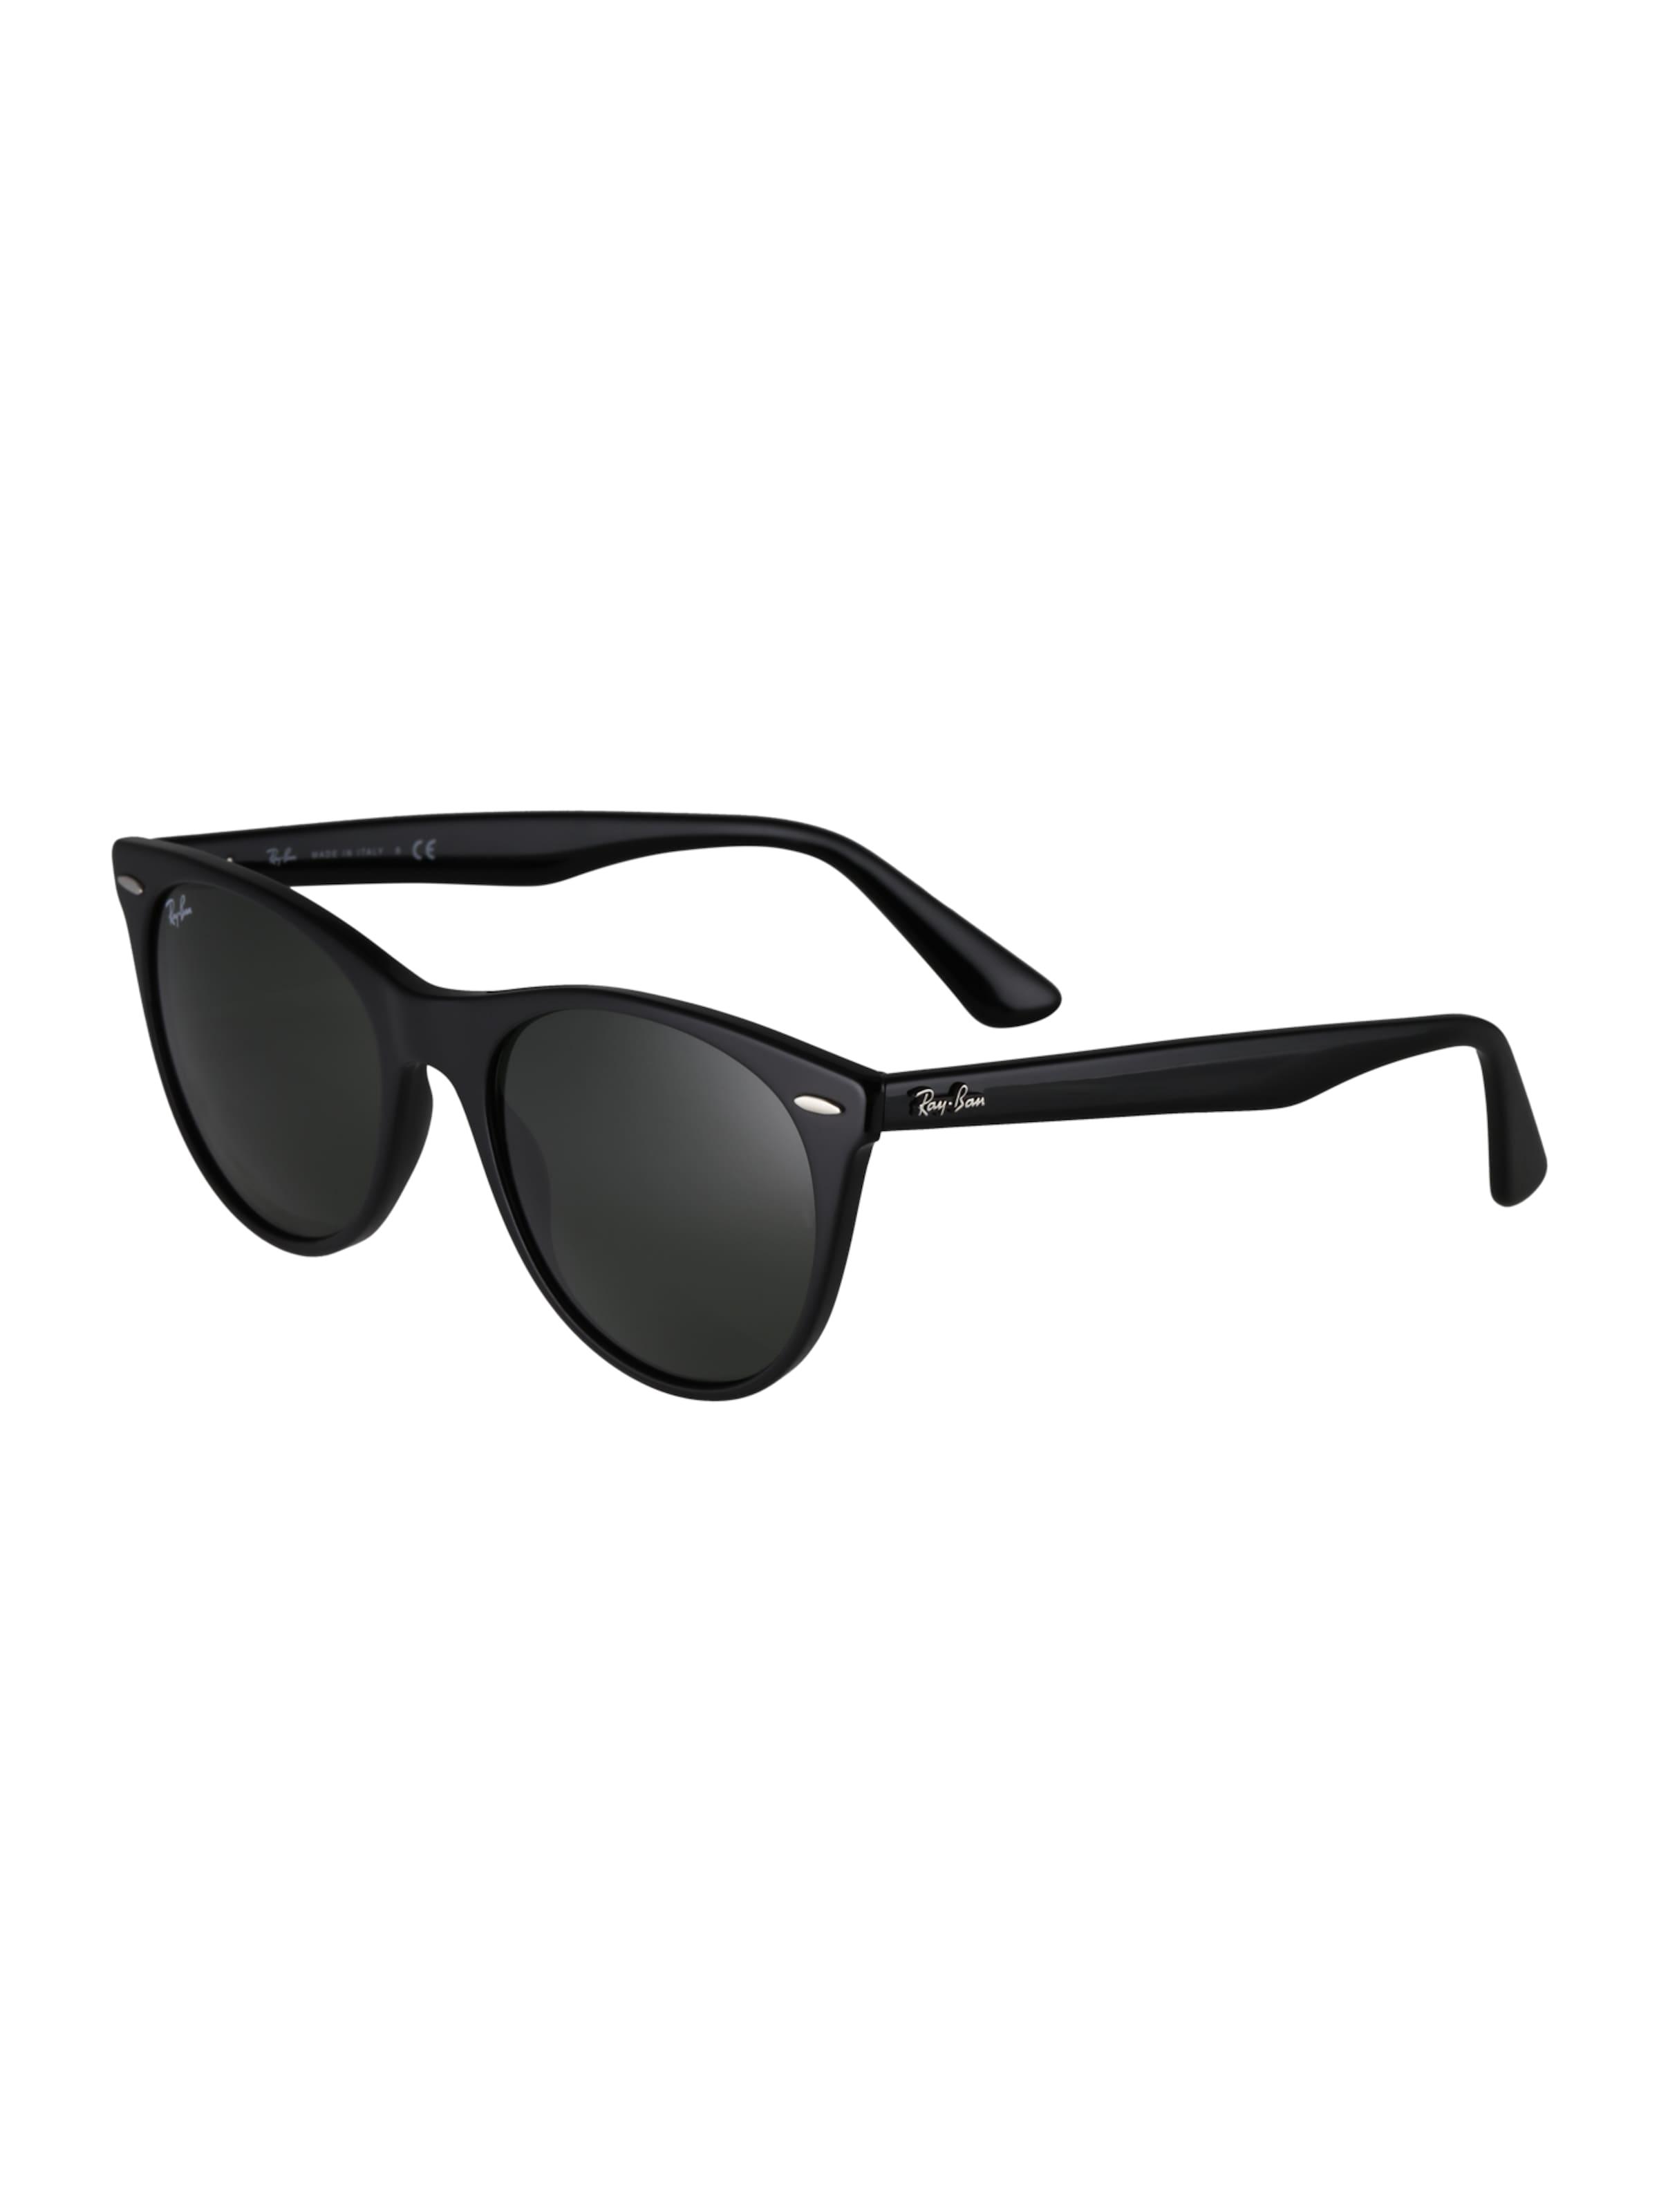 Ray Ray Zwart Zwart Zonnebril ban ban Zonnebril Ray In ban Zonnebril In Pkn0wO